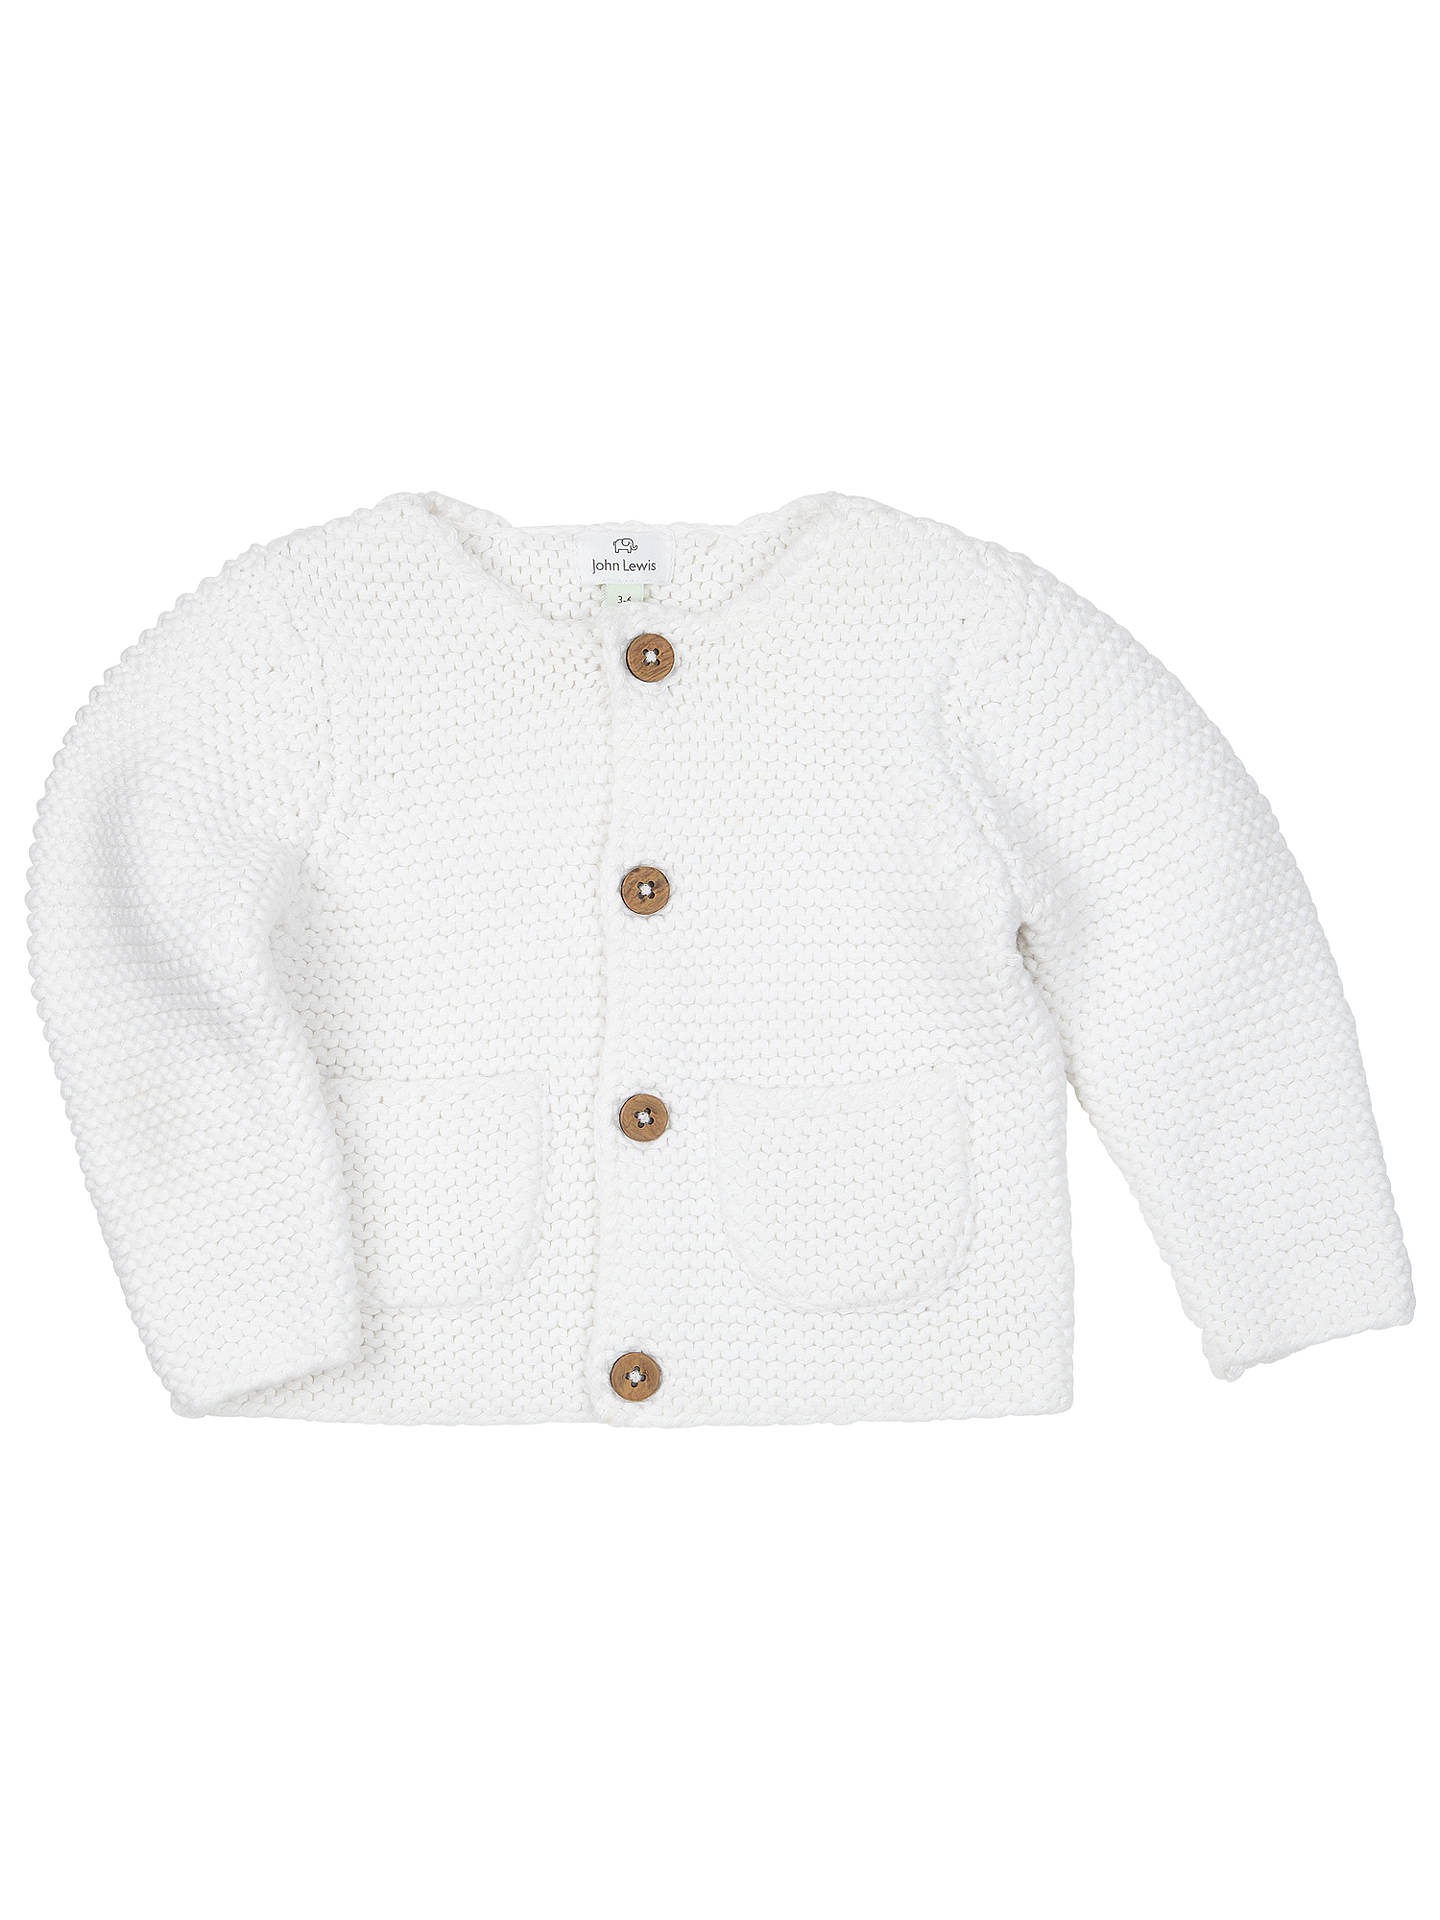 846f19d3f John Lewis   Partners Baby s Chunky Knit Cardigan